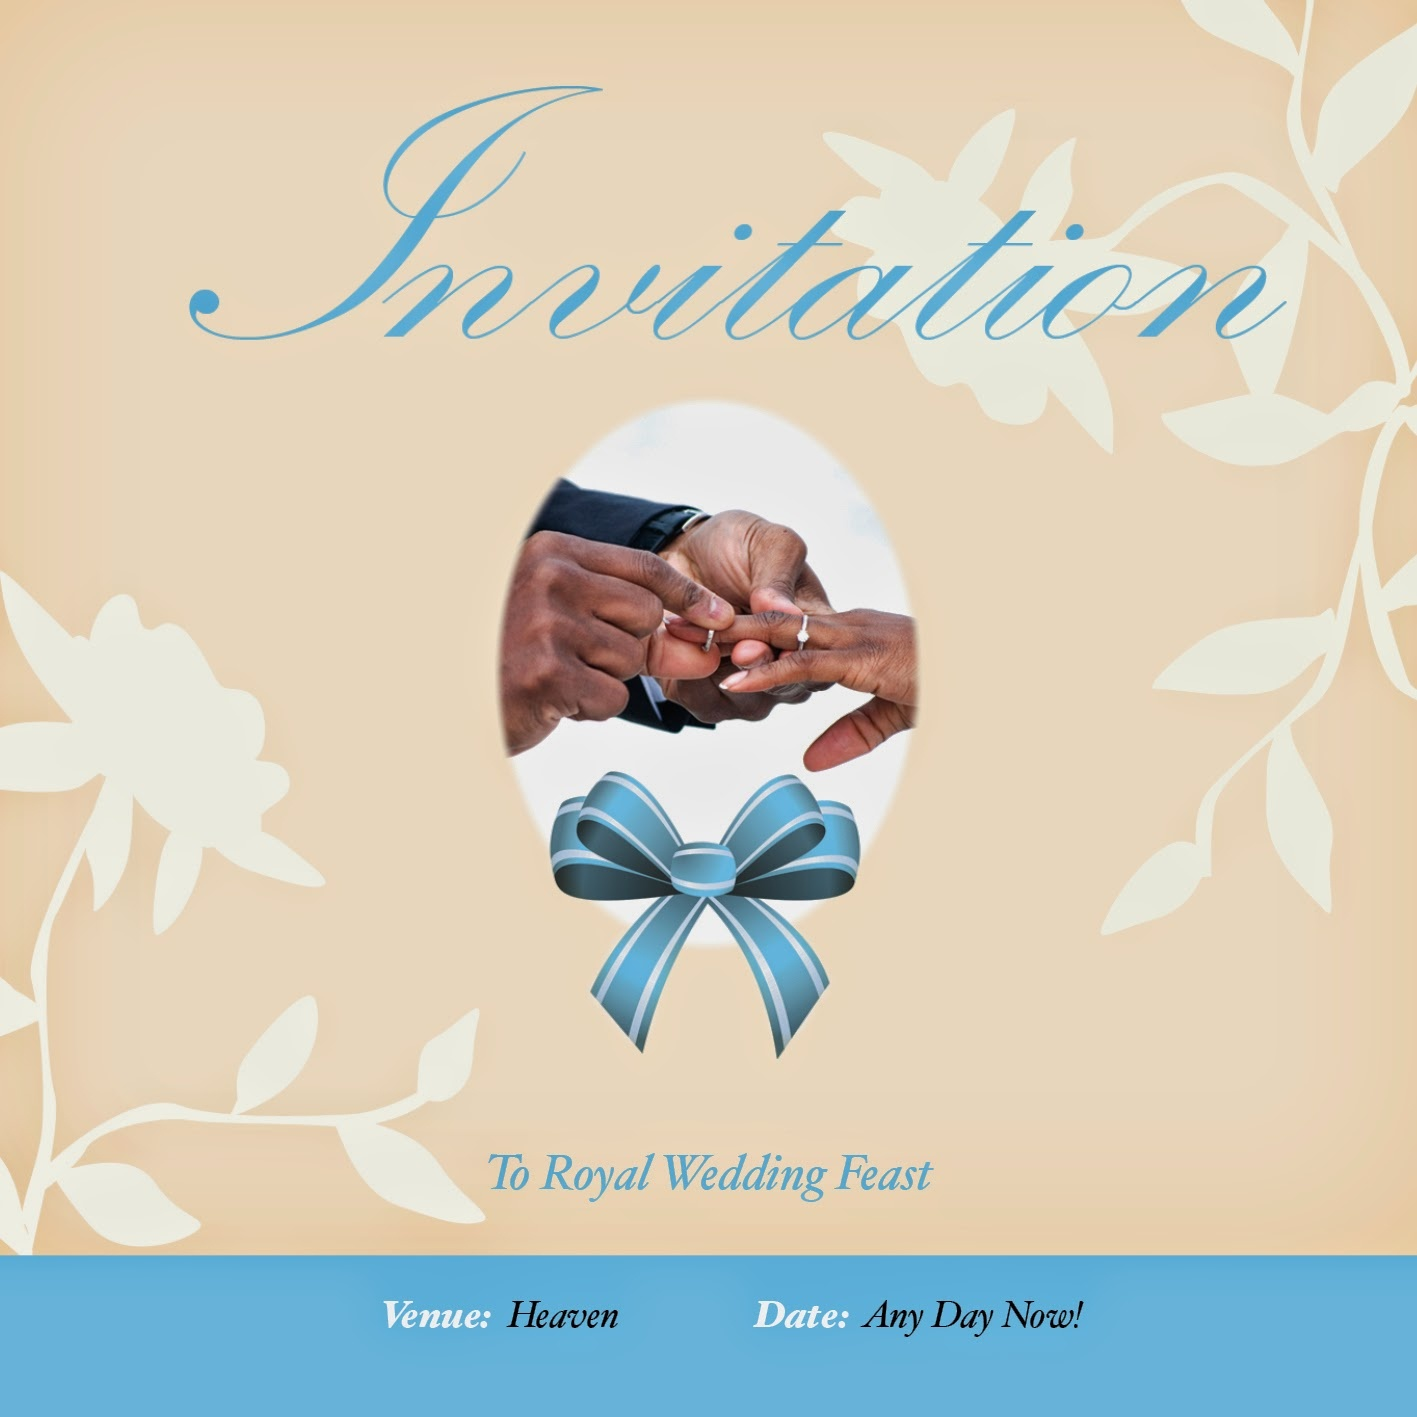 Home Printable Wedding Invitation Evangelism Tract | Freevangelism - Free Printable Tracts For Evangelism